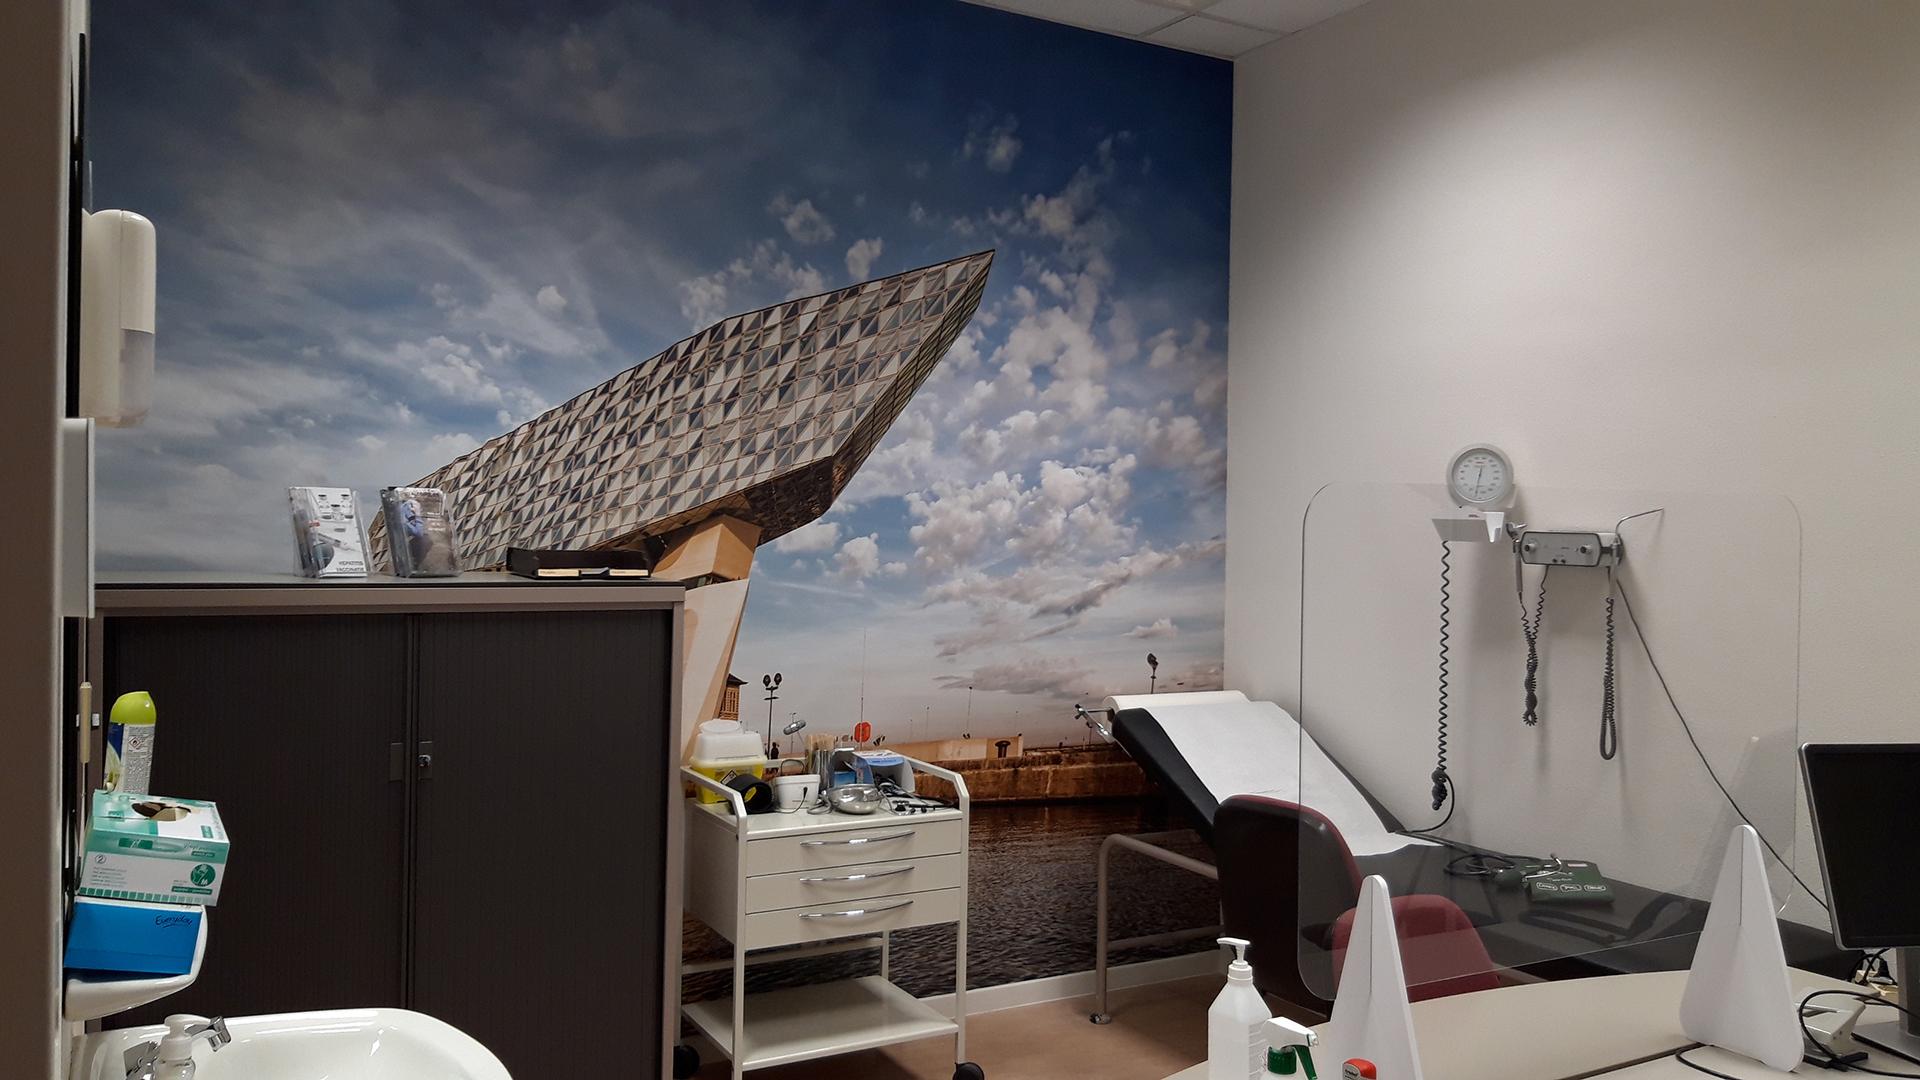 walltex_wanddecoratie